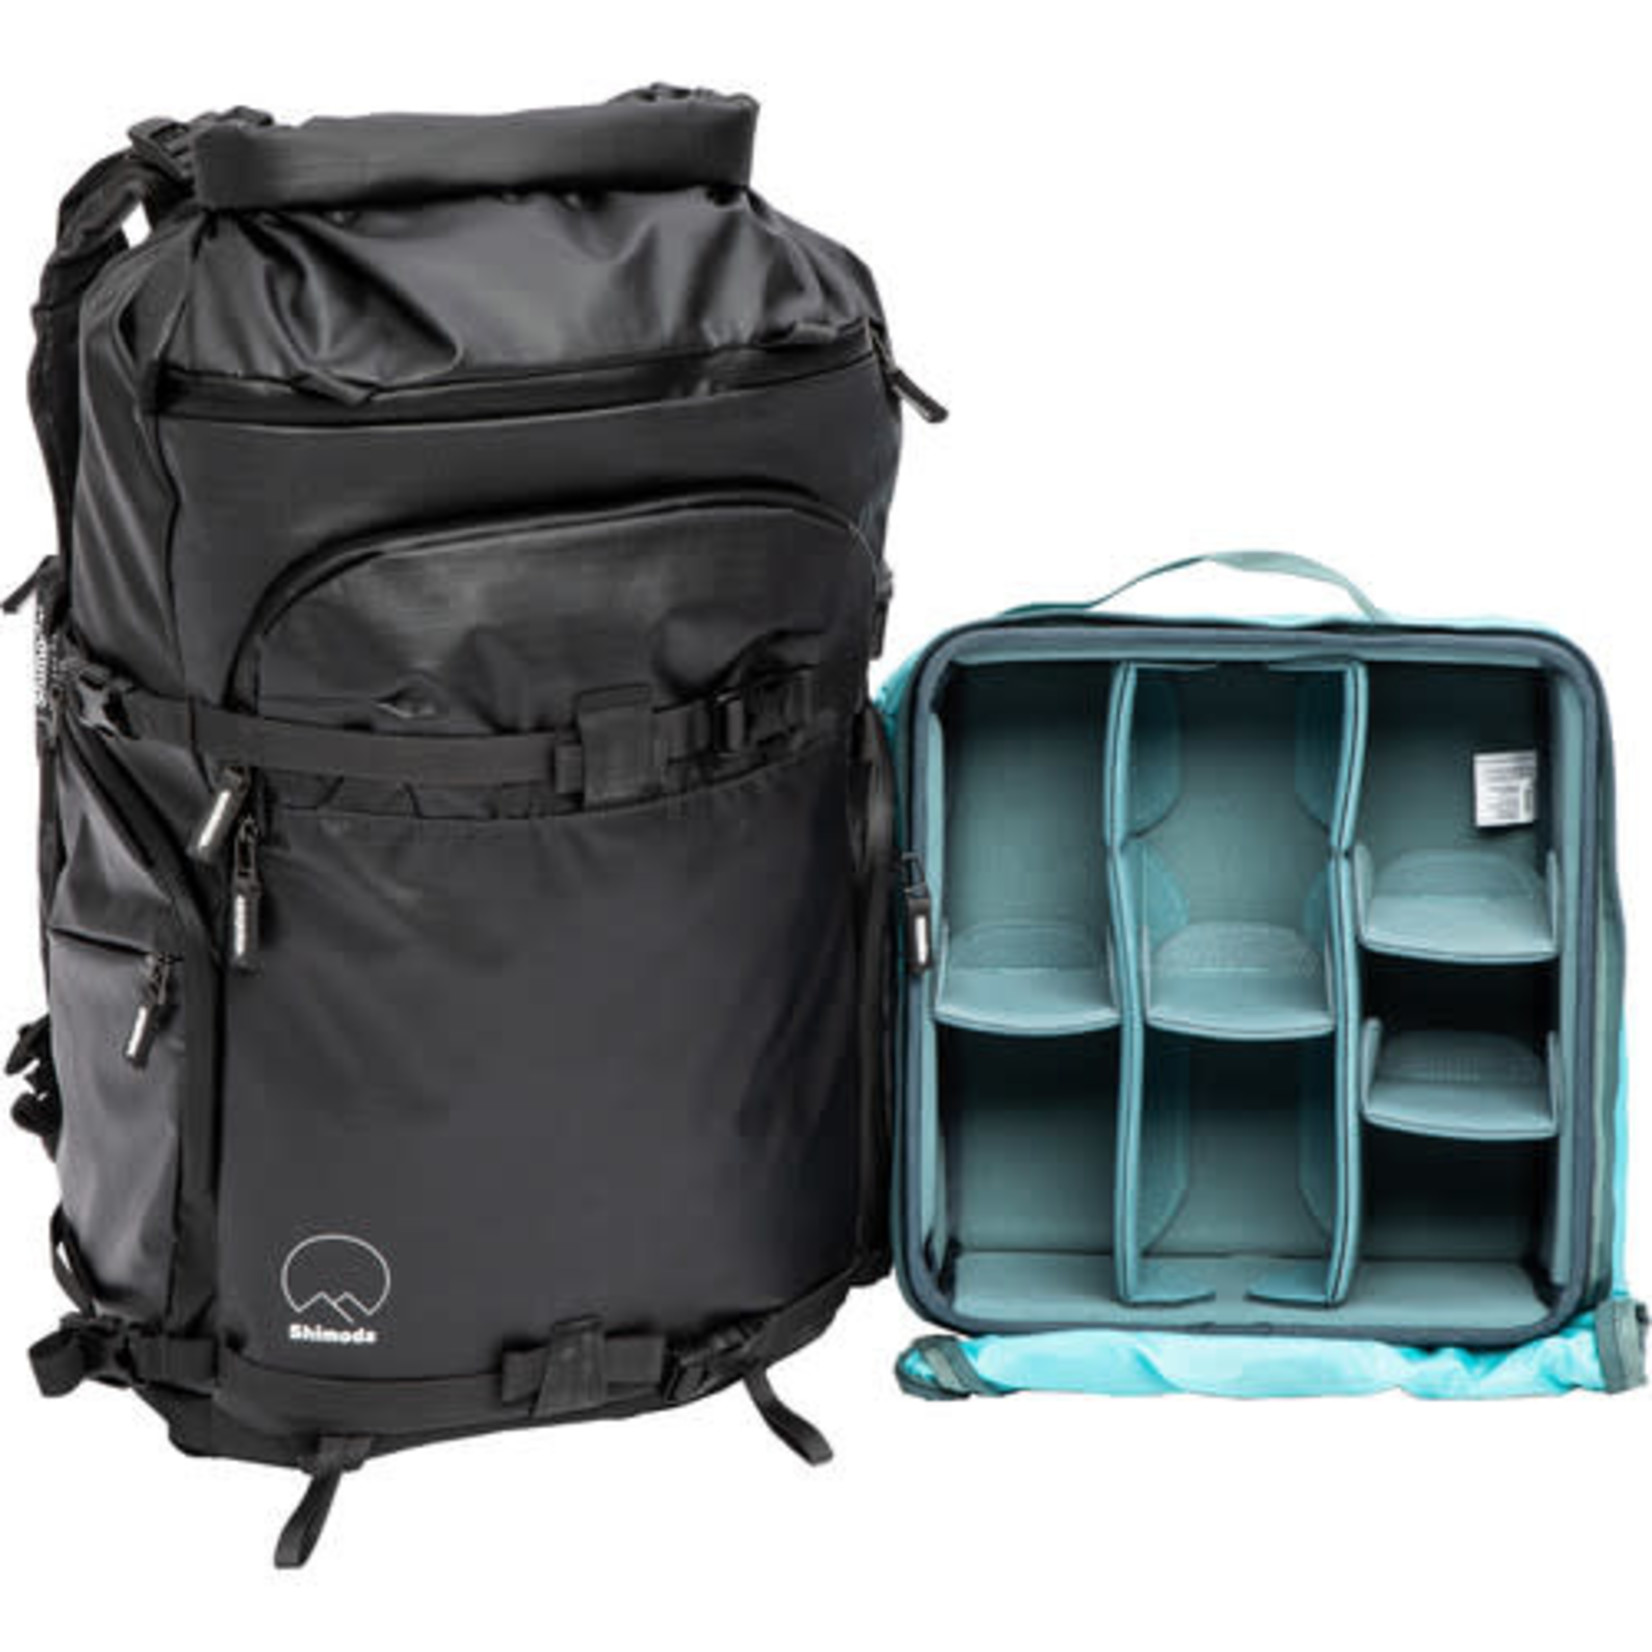 Shimoda Shimoda Designs Action X30 Backpack Starter Kit with Medium Mirrorless Core Unit Version 2 (Black)